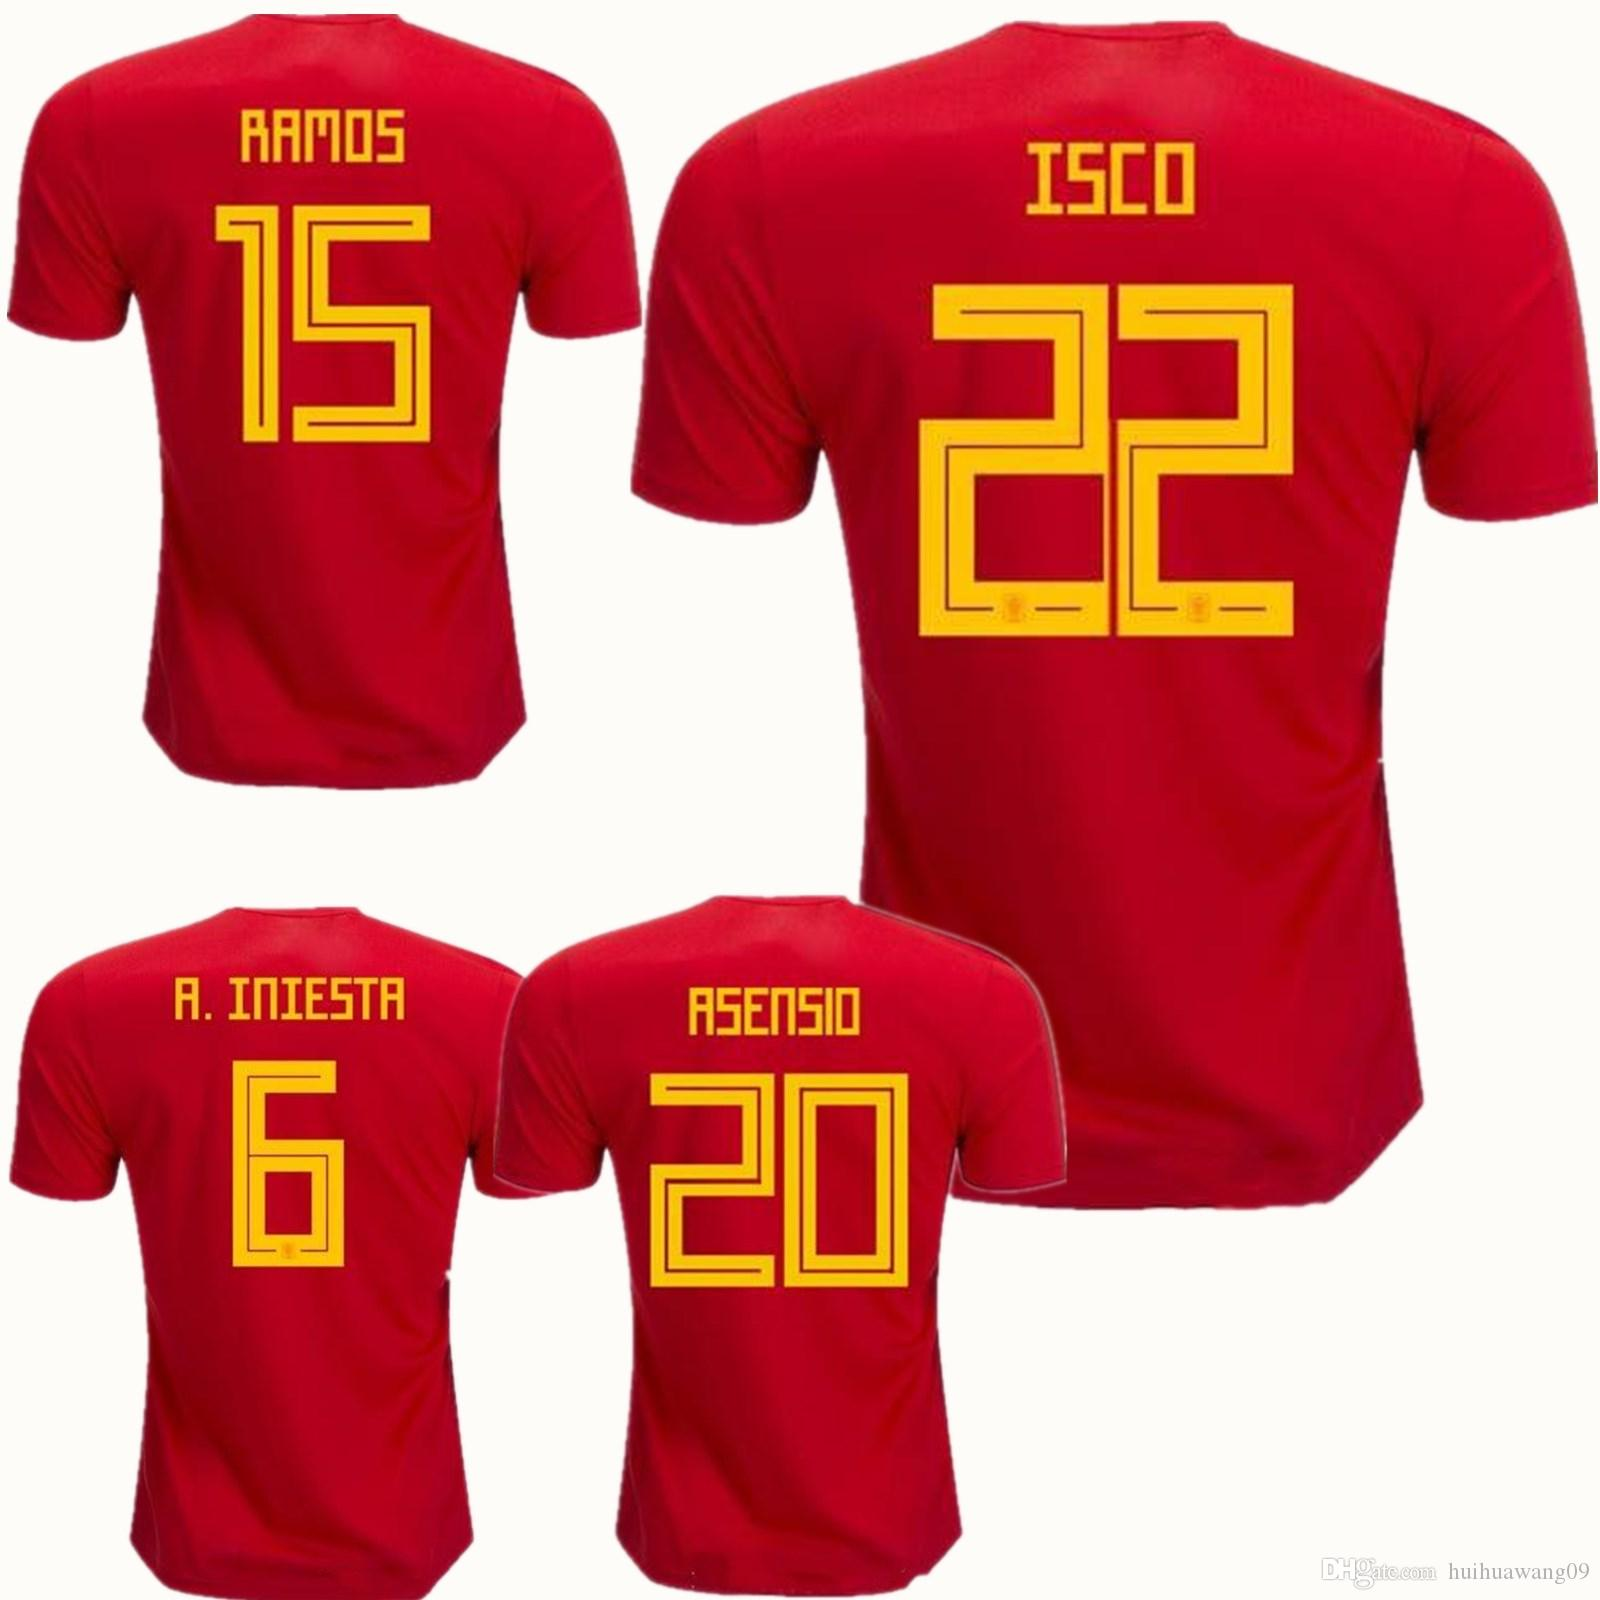 2018 World Cup Spain Soccer Jerseys Pique Romas A.iniesta Ramos ... 80b7179c0